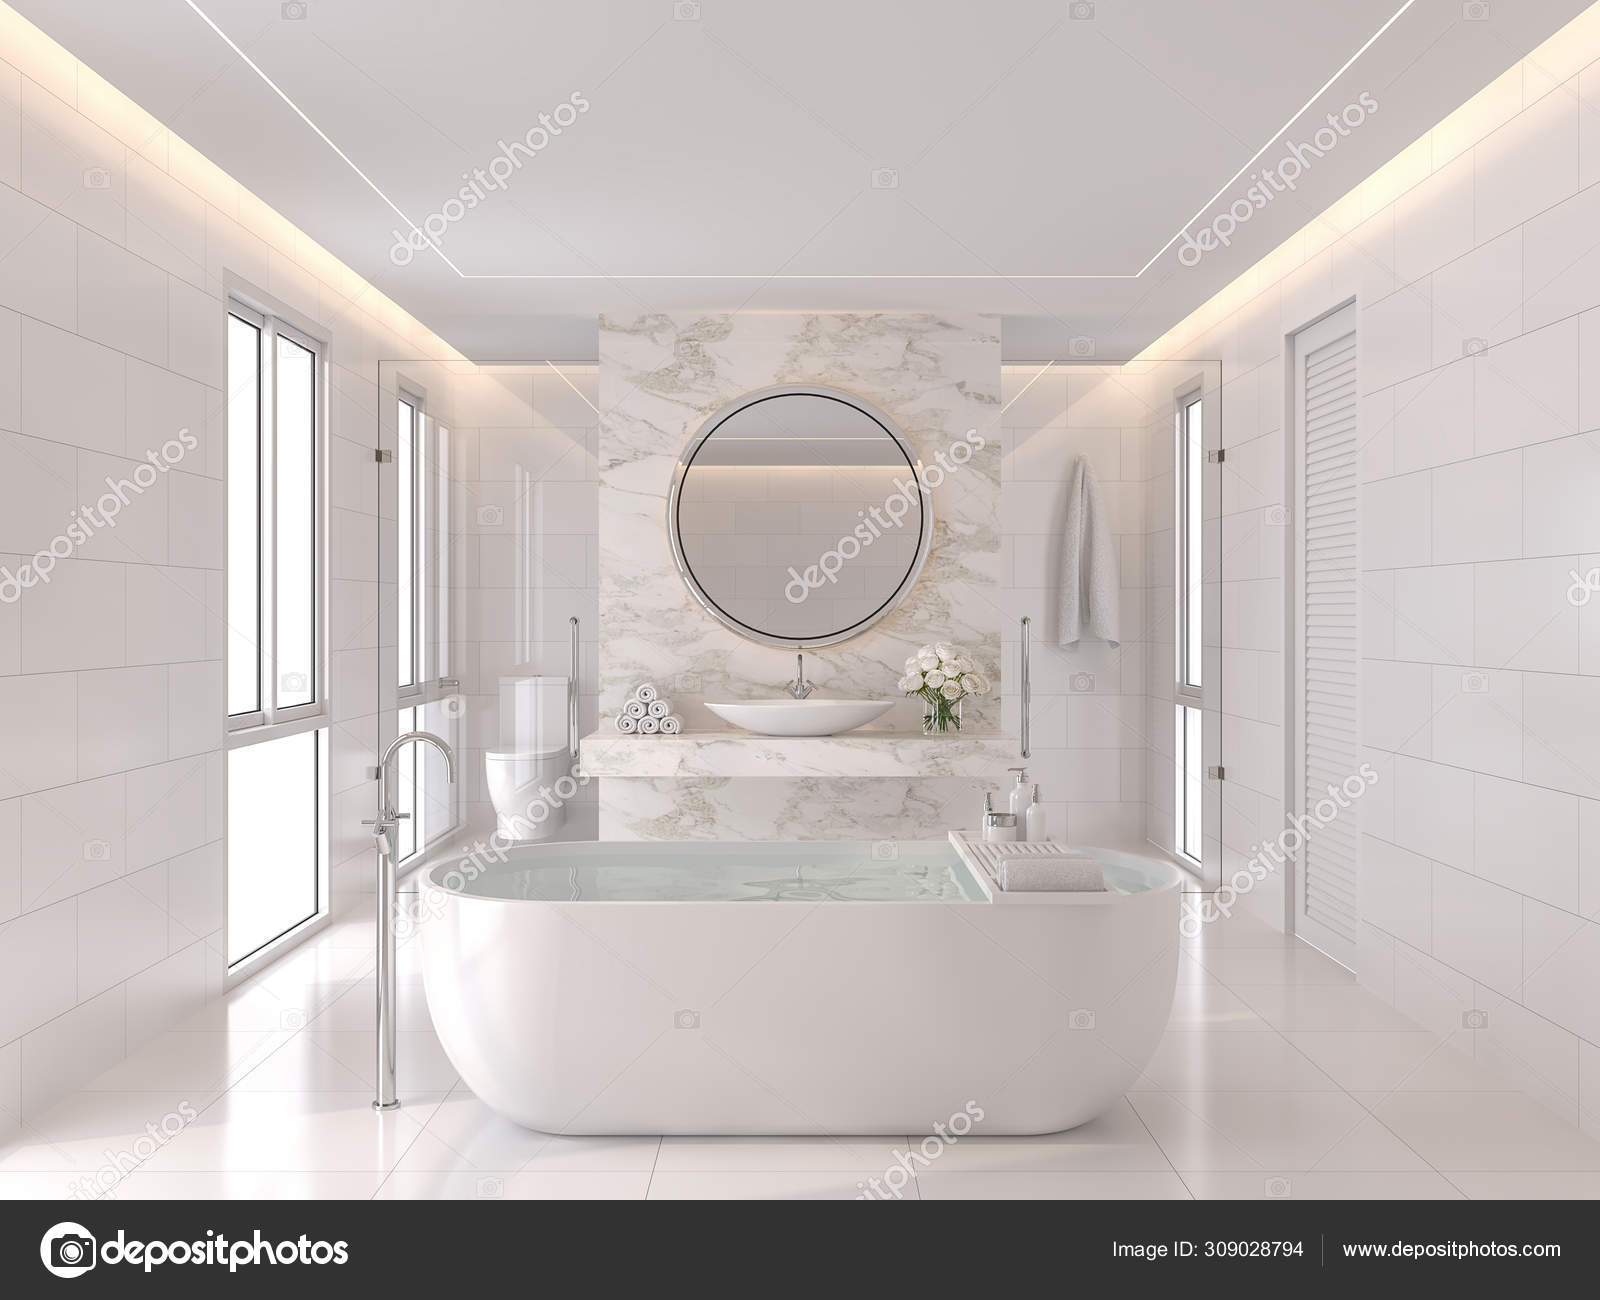 luxurious white bathroom modern style render room has white tiles stock photo image by c onzon 309028794